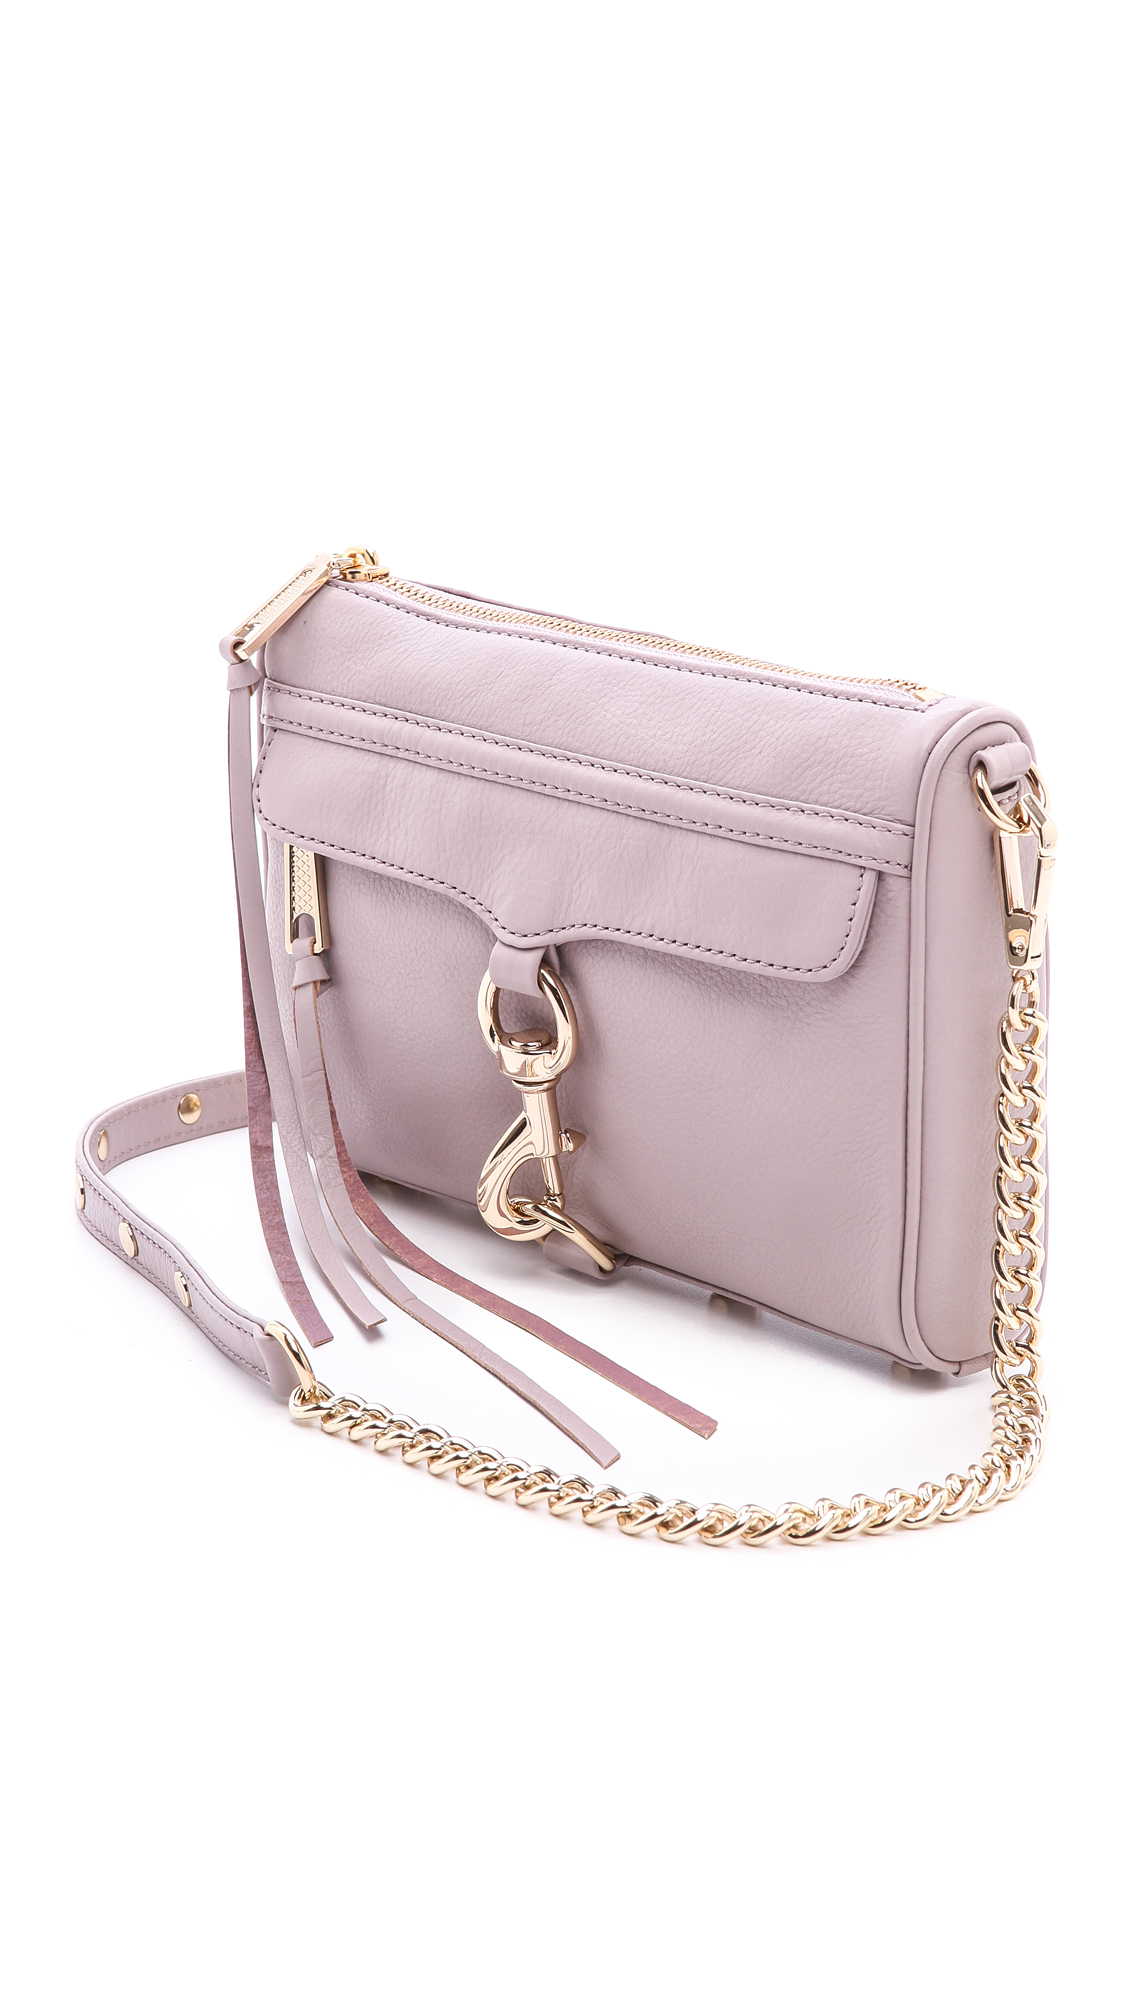 70d8c1adb7 Rebecca Minkoff Mini MAC Bag   SHOPBOP